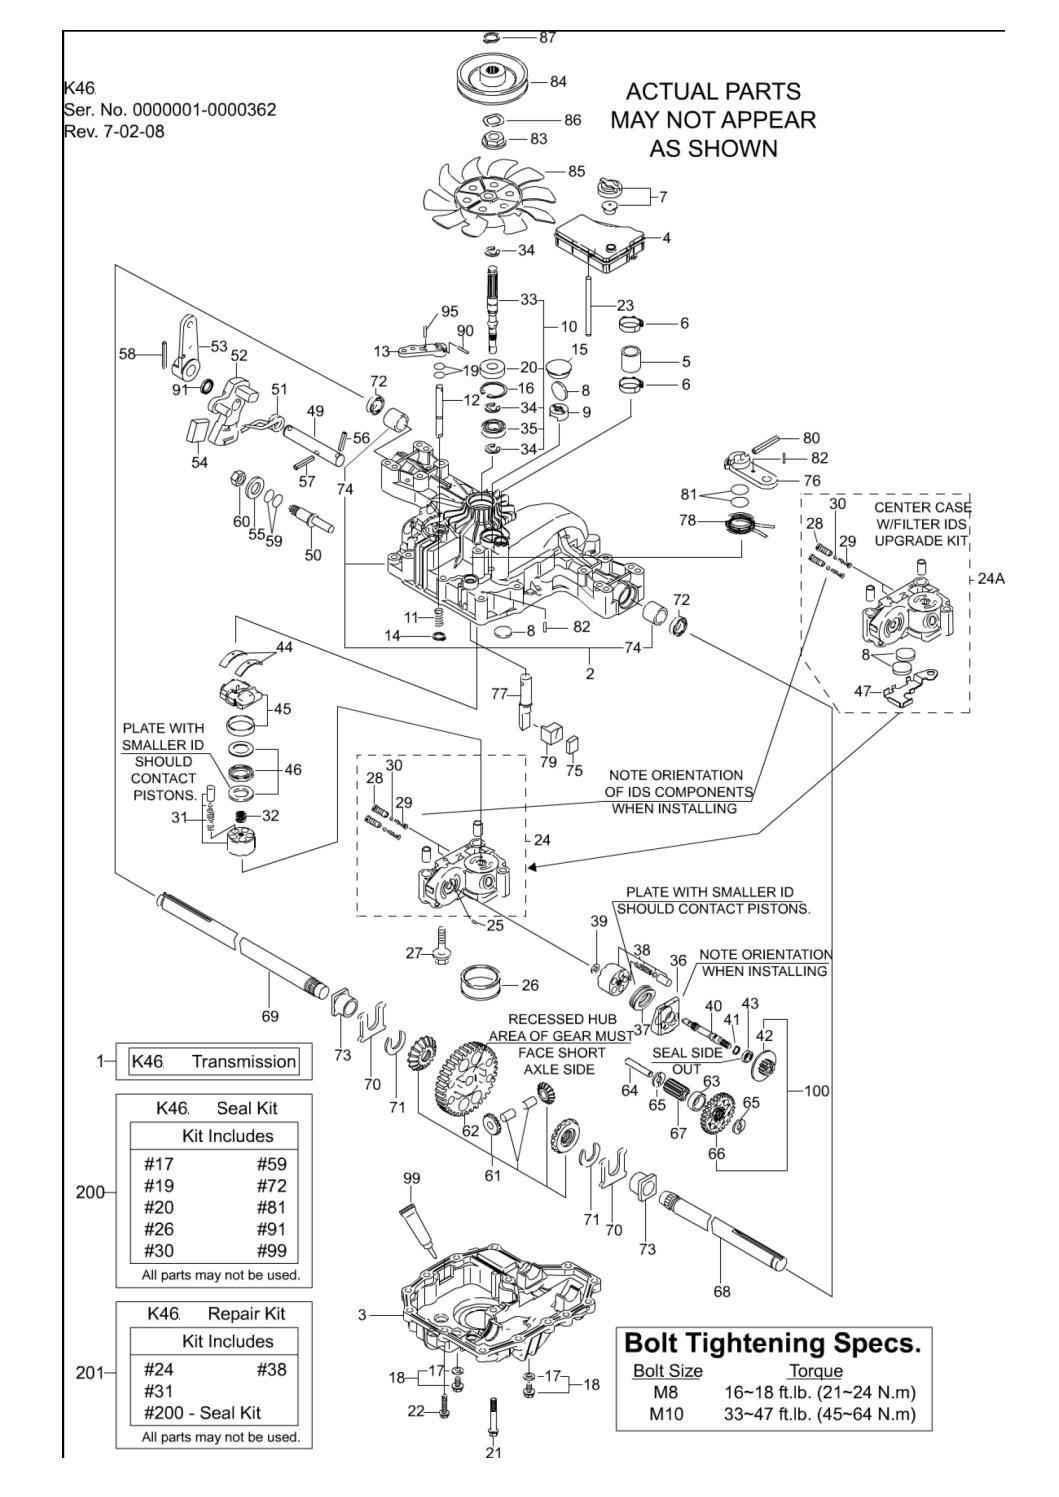 Transmission Group - Tuff Torq K-46Bf - Snapper LT300... | ManualsLib